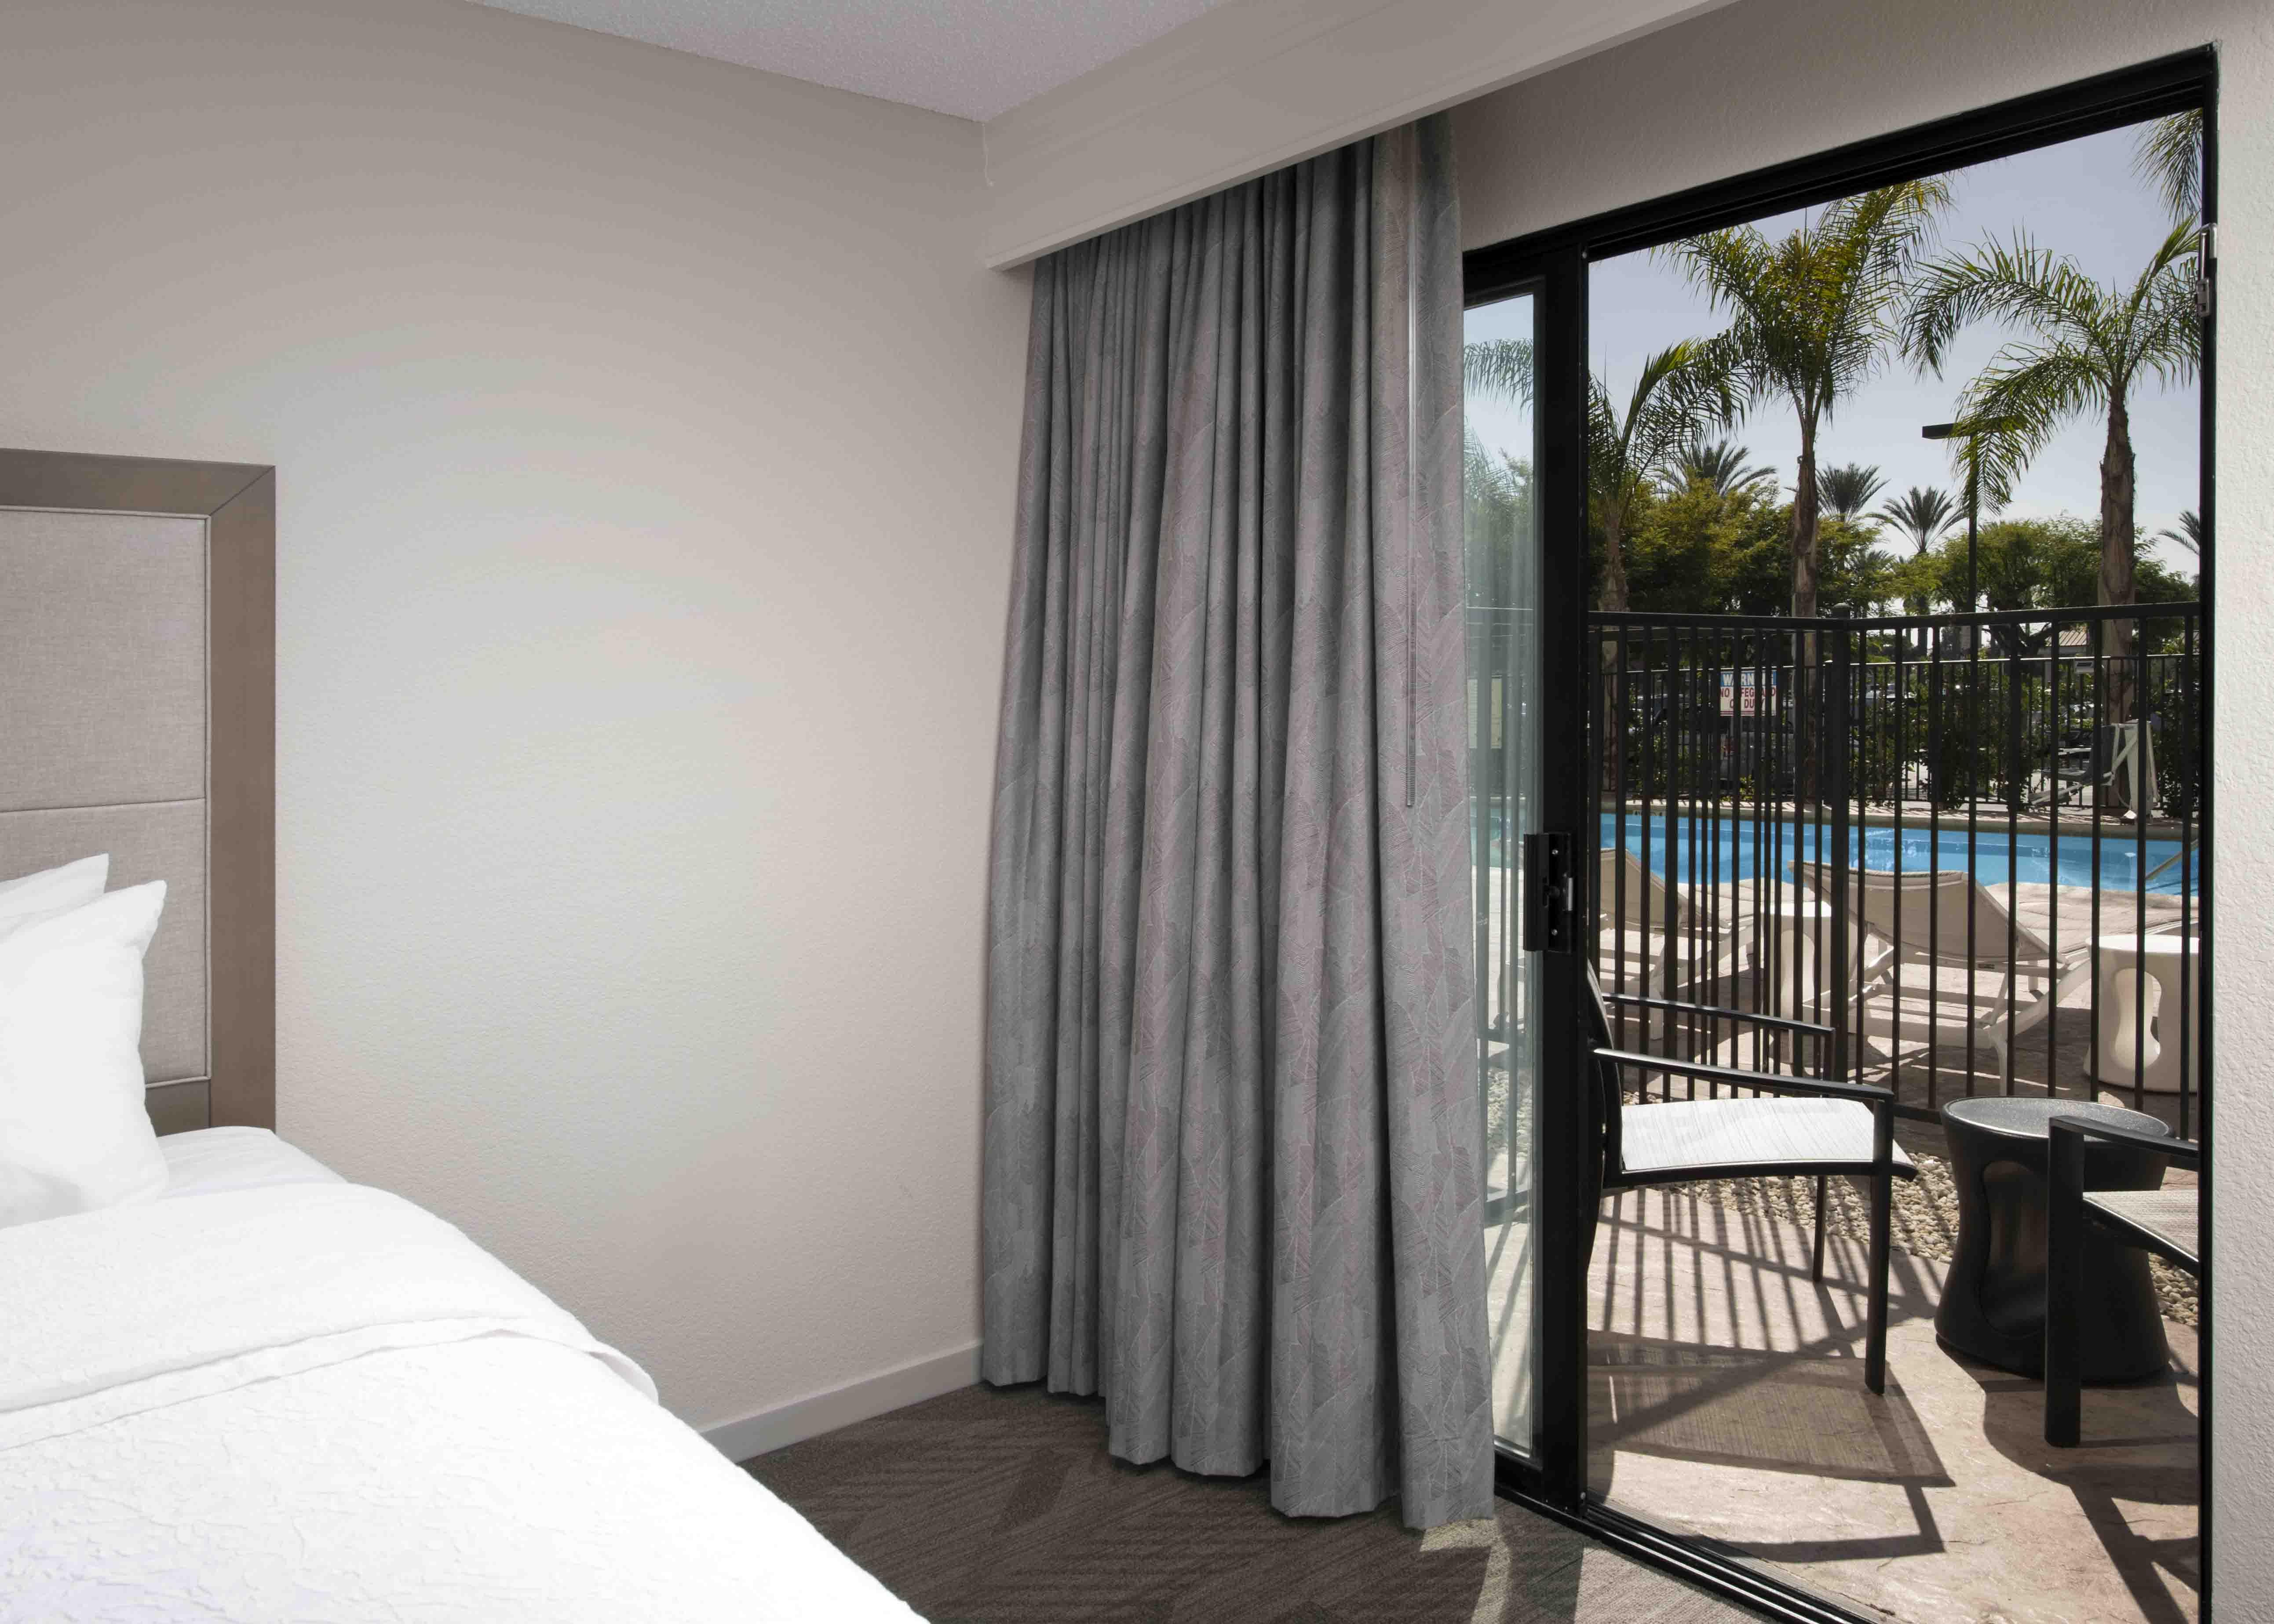 Hampton inn suites by hilton anaheim garden grove disneyland hotels 2 queen lanai with tub for Garden suite hotel los angeles